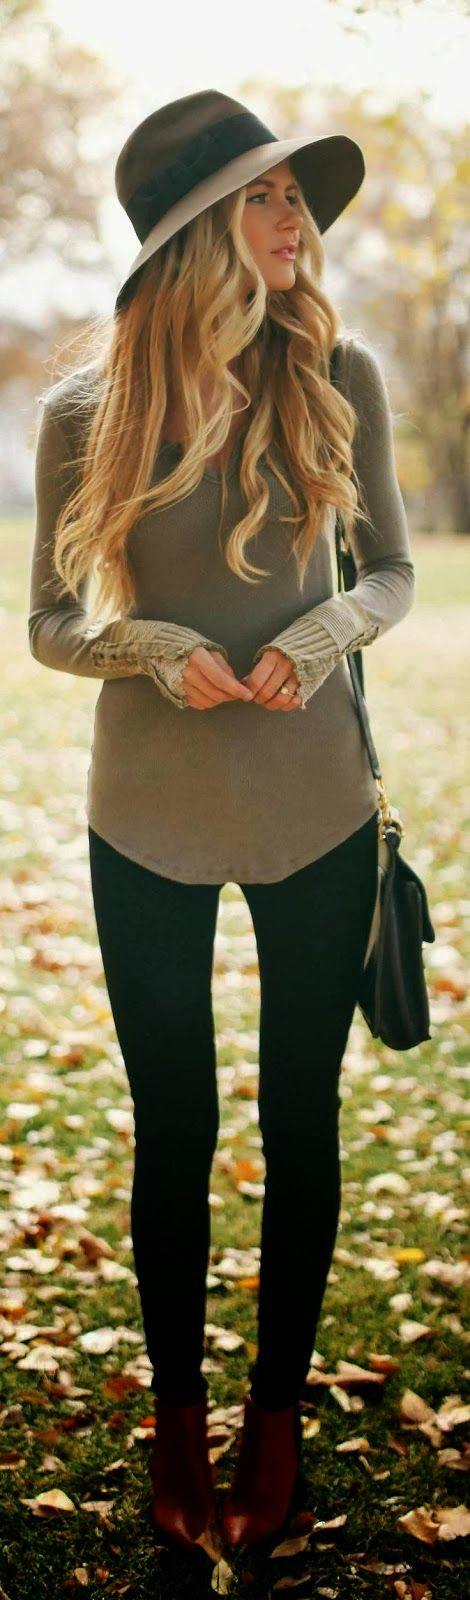 Cute Shirt With Black Leggings And Hat Chelsea, Chelsea Hair, Haris Salon Chelsea, Winter Hair inspiration